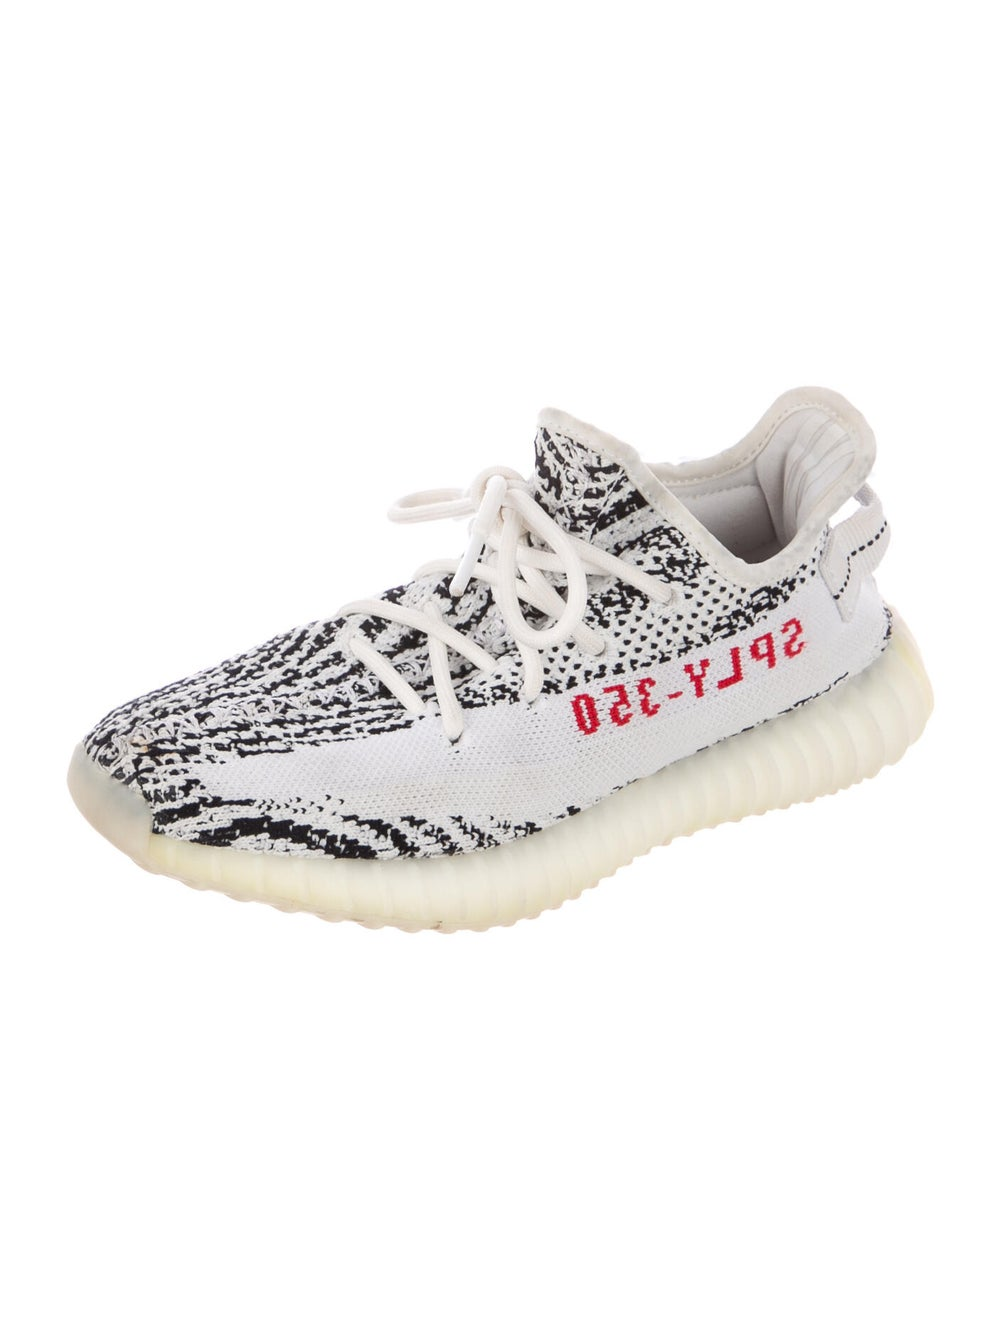 Yeezy x adidas Boost 350 V2 Zebra Sneakers Sneake… - image 2